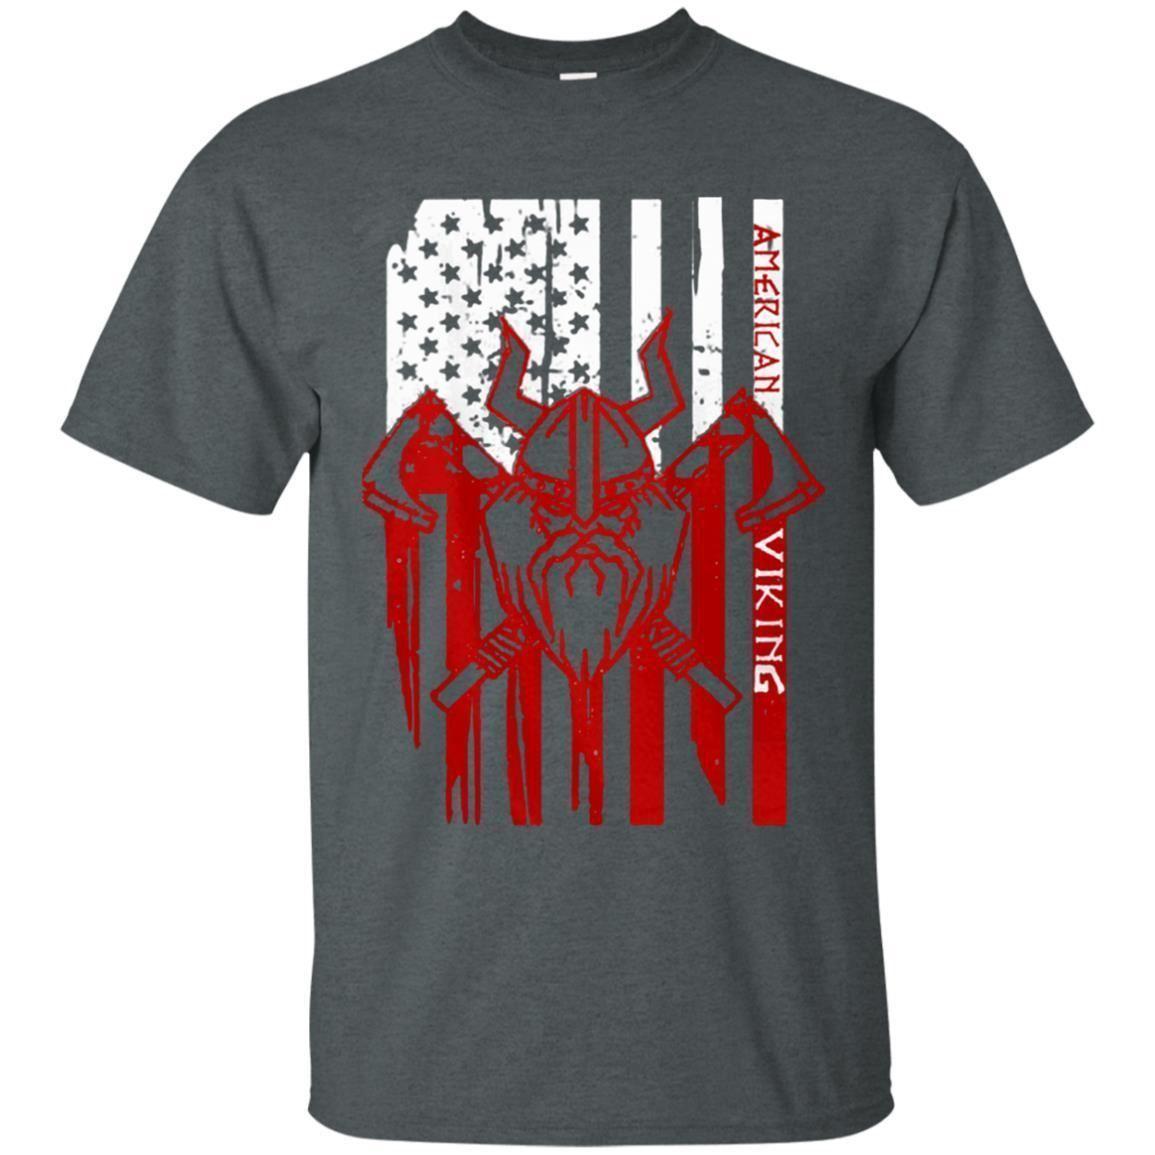 Comfy American Viking - Victory Or Valhalla 2 Unisex Tee TShirt